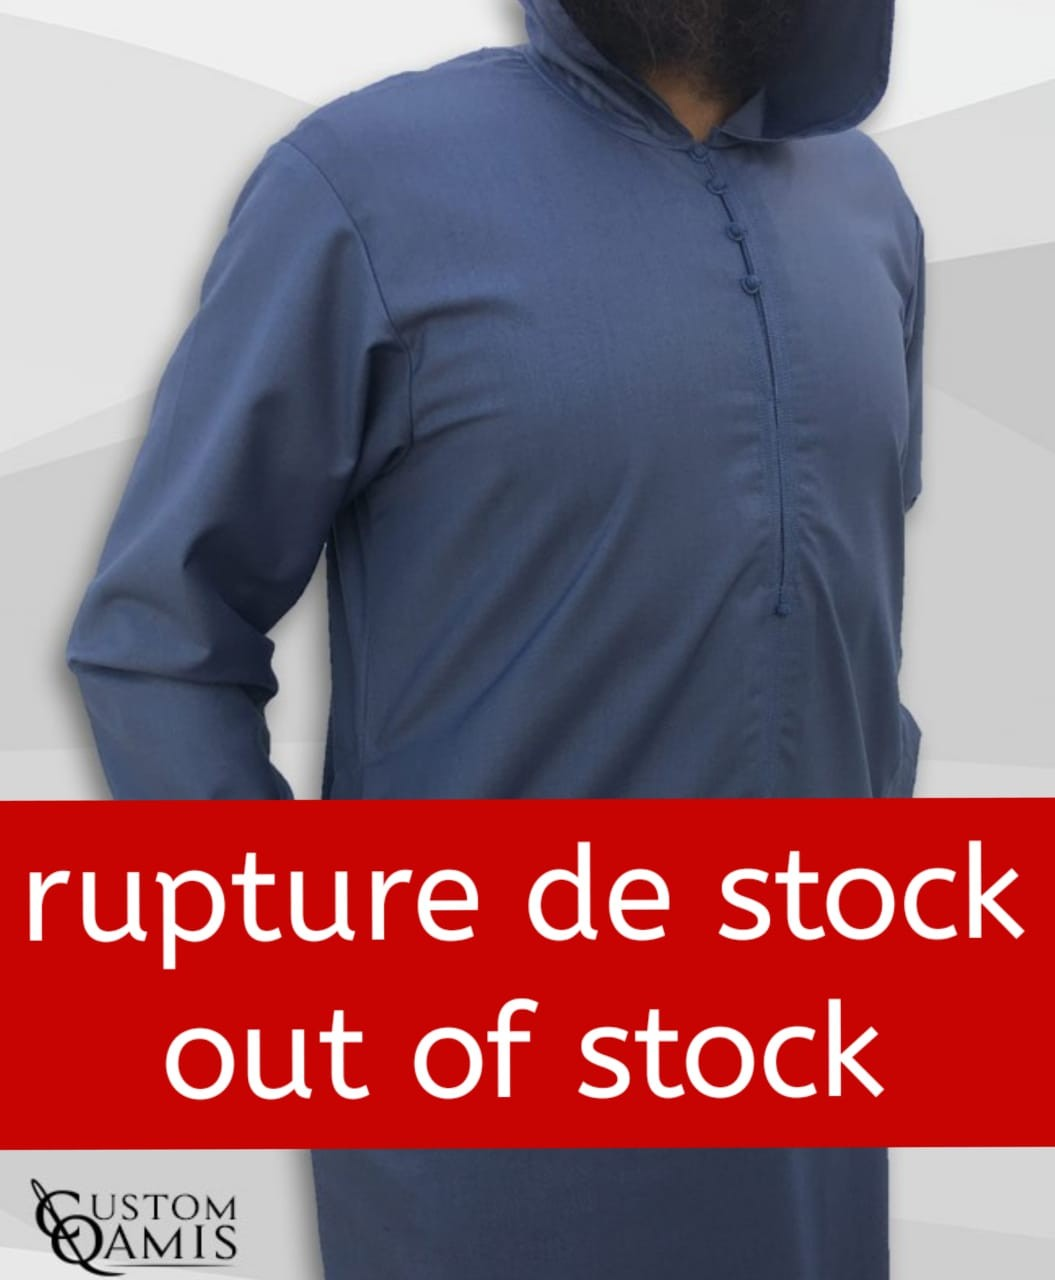 Djalabiya tissu Cashmere Wool gris bleuté